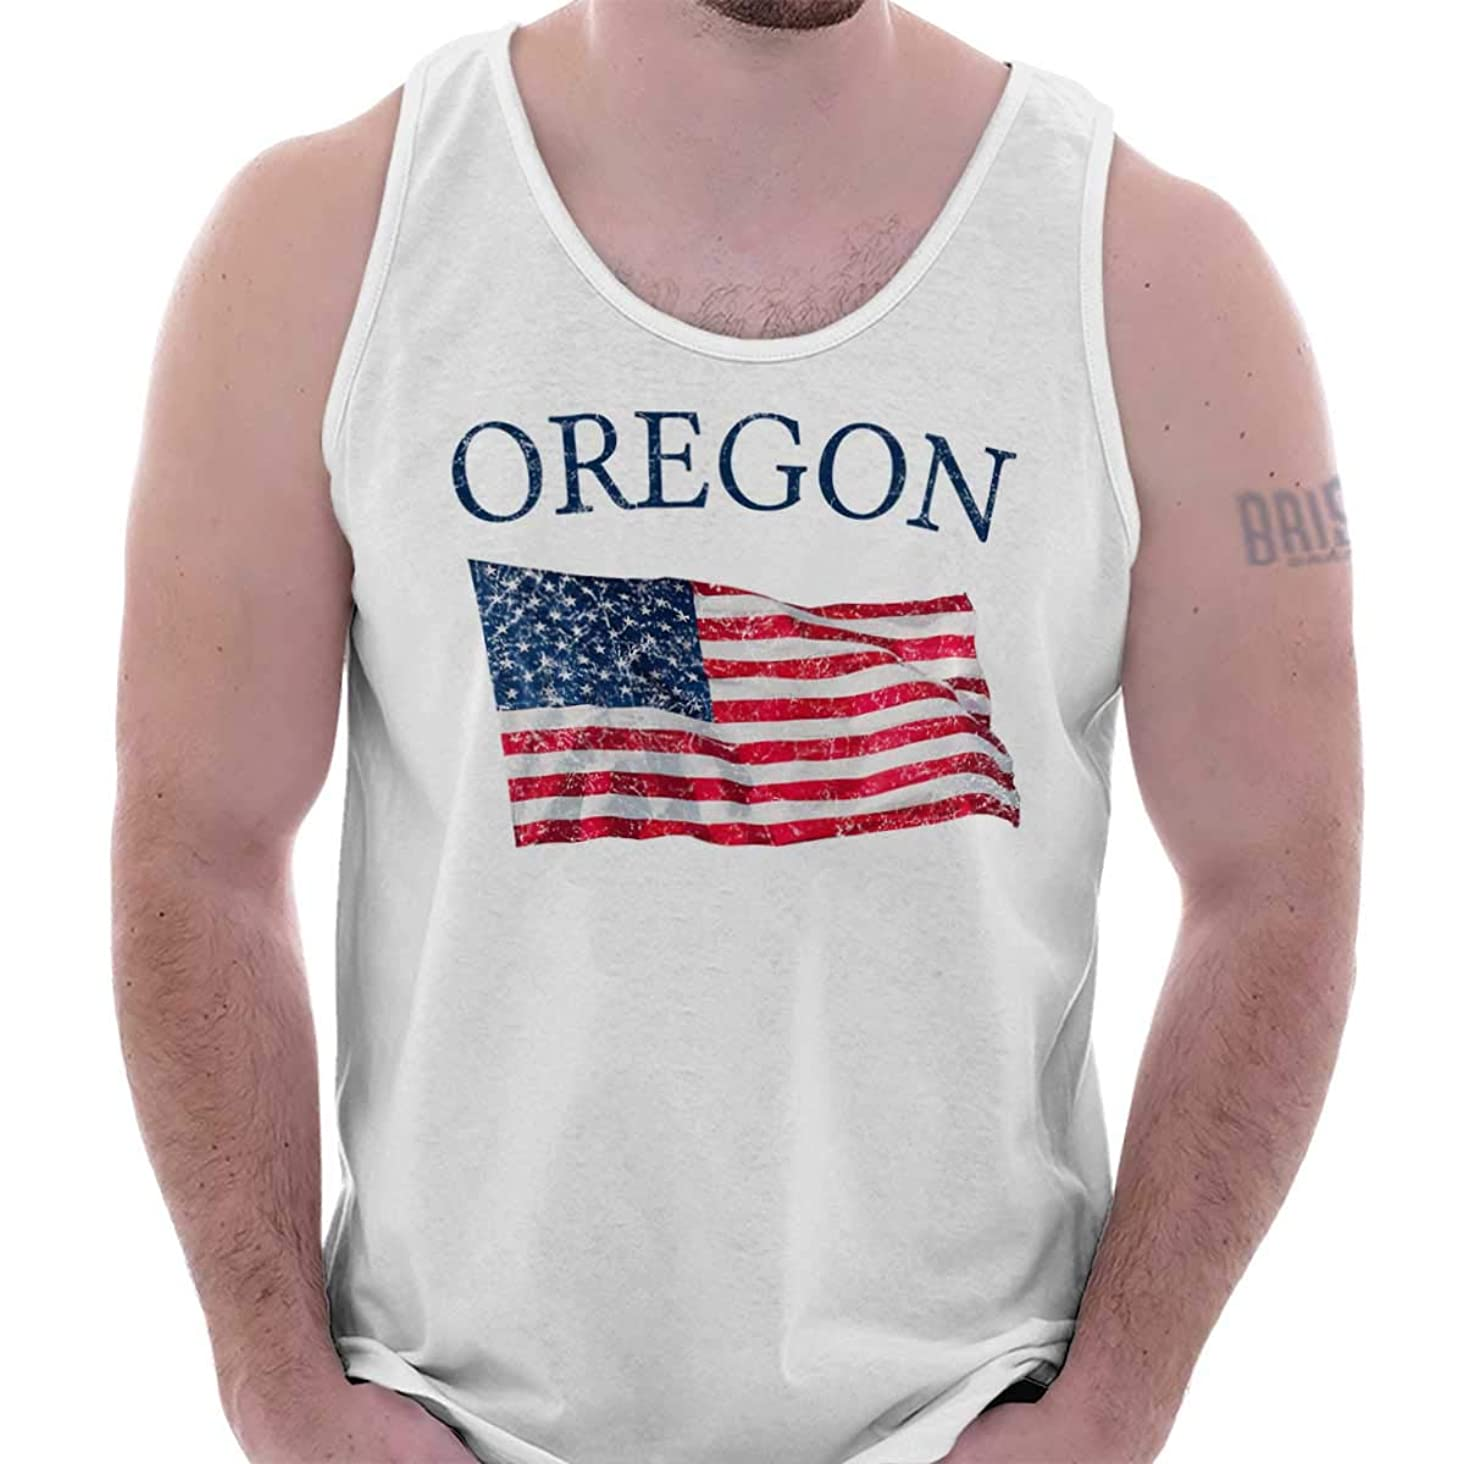 Oregon United States Patriotic USA Flag OR Tank Top